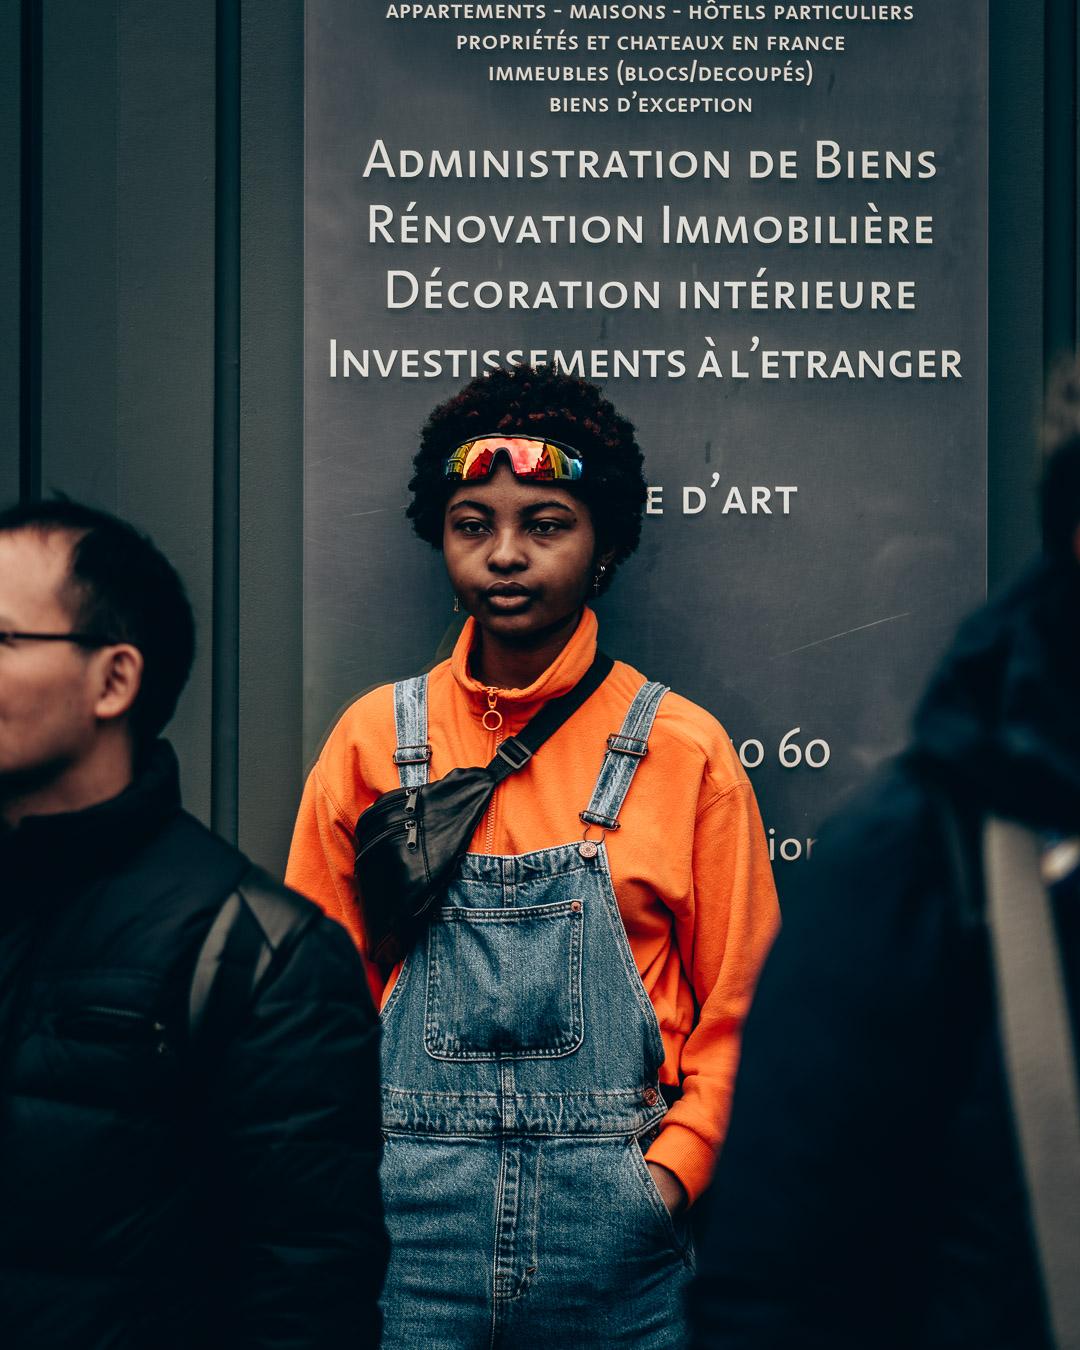 street fashion portrait photography at Paris Fashion Week